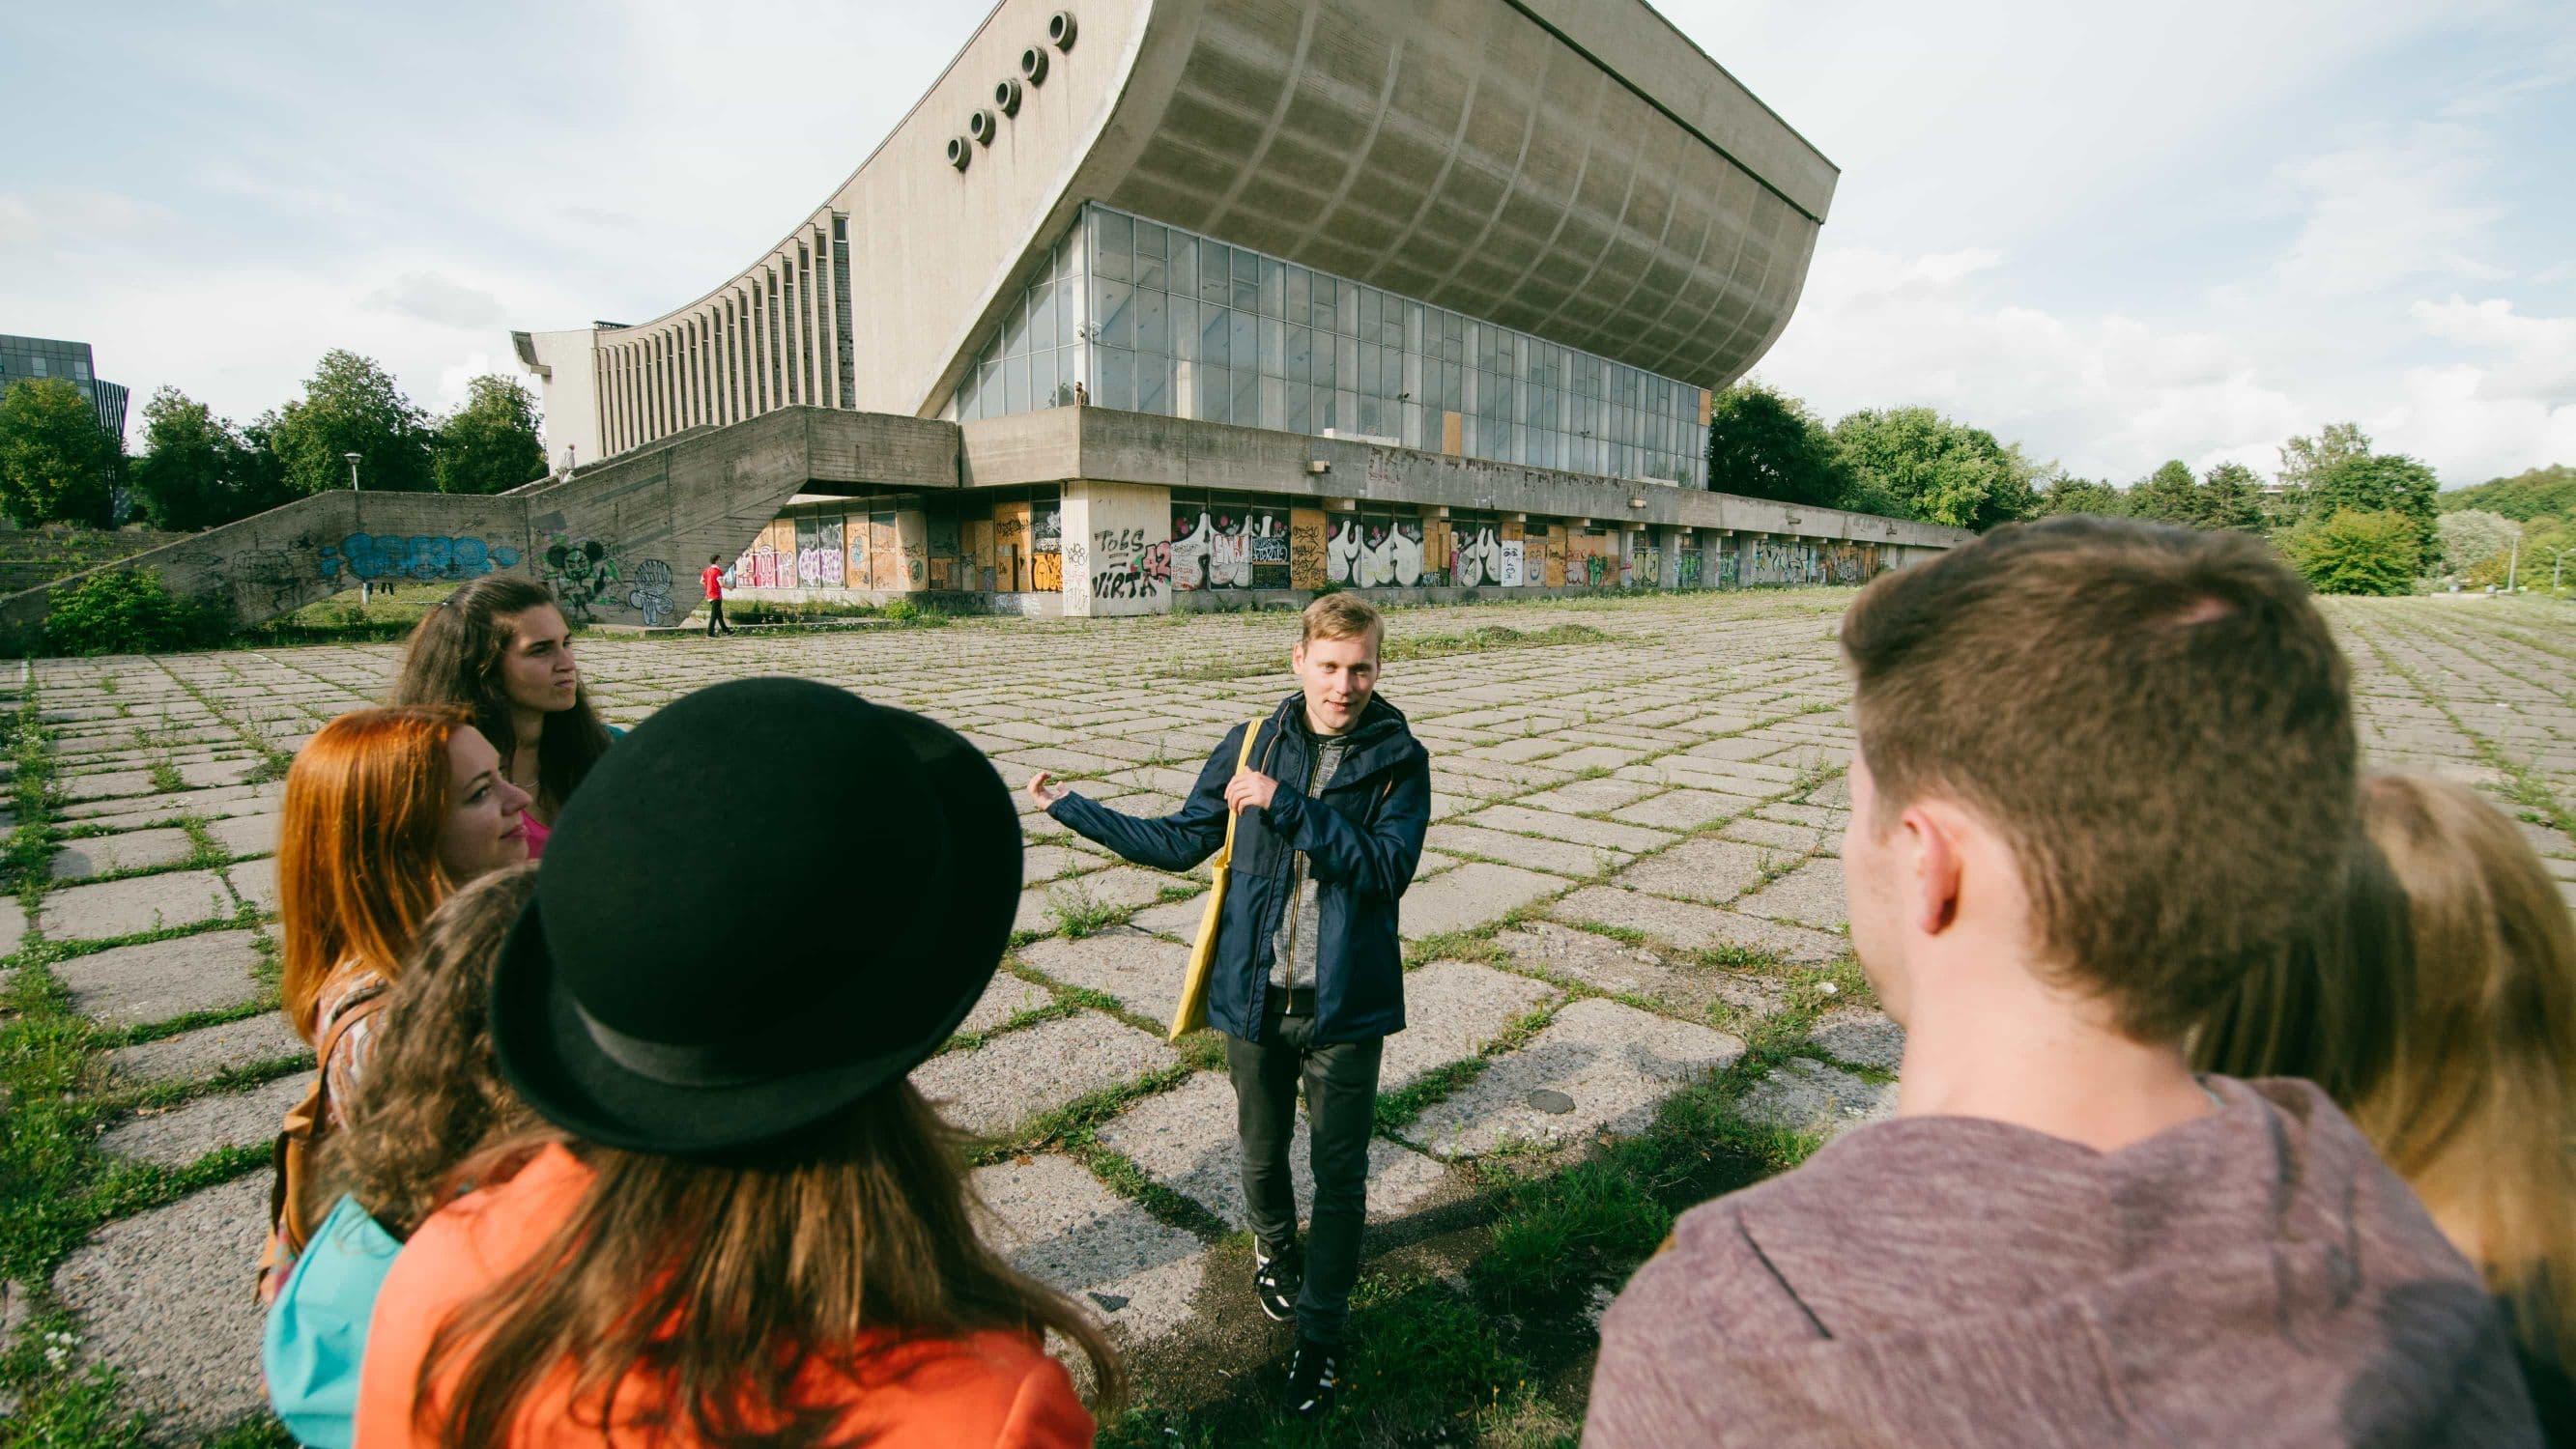 Palace of Concerts & Sports on Soviet Vilnius tour